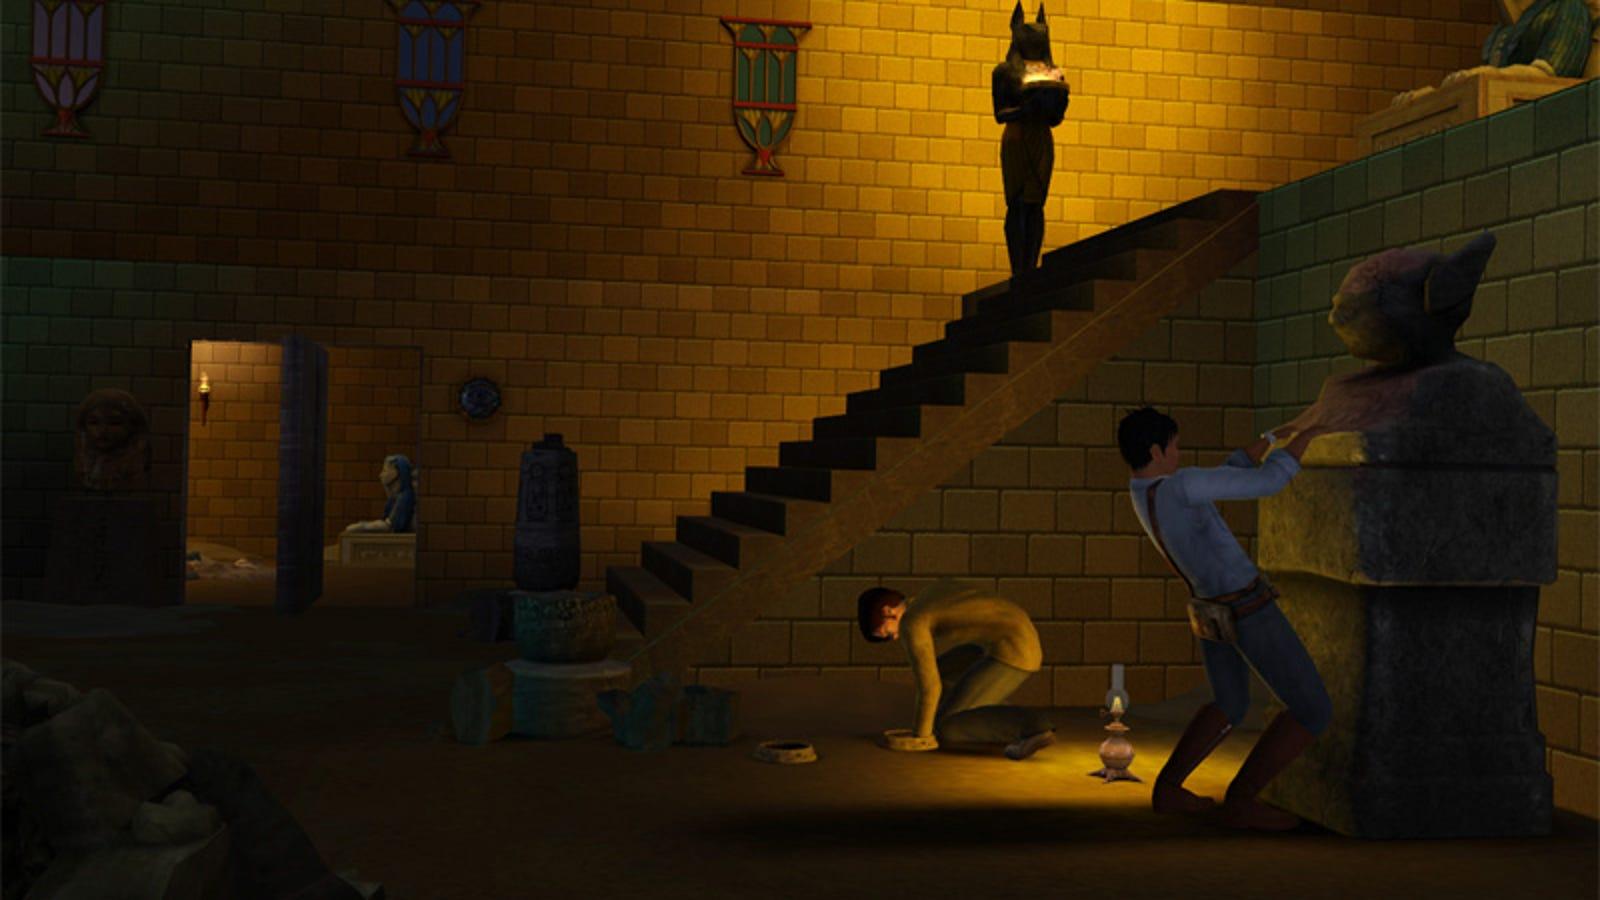 the sims 3 world adventures goes underground